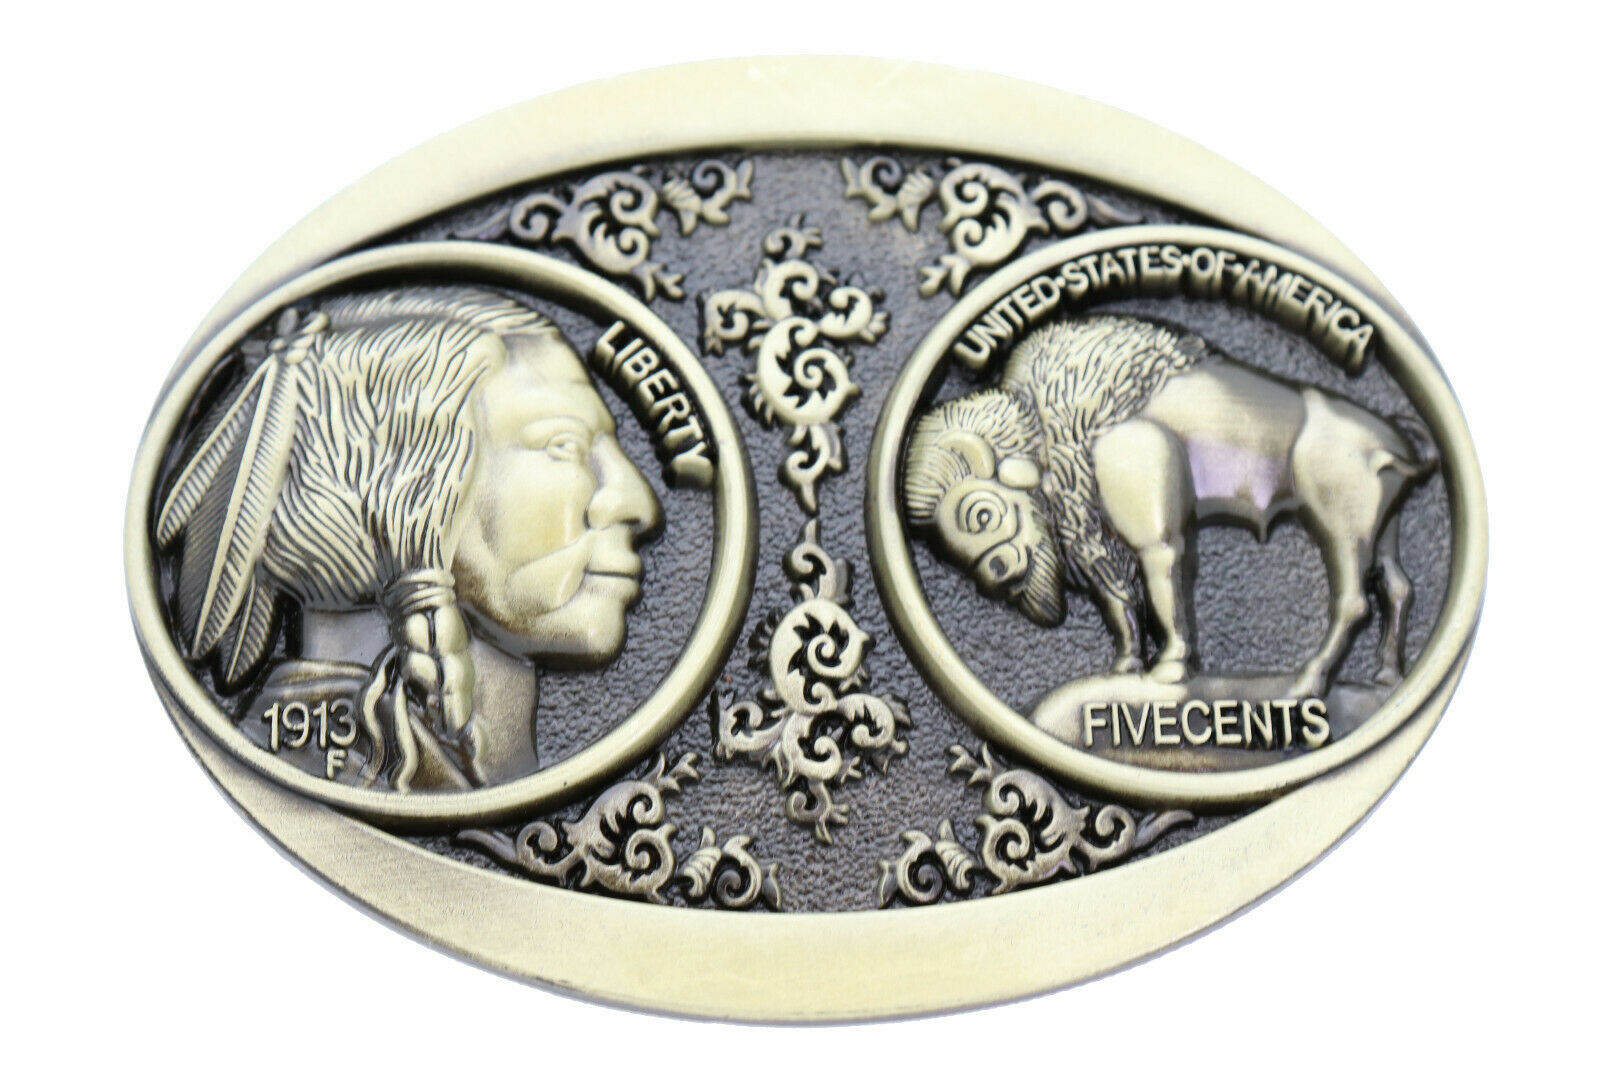 Herren Native Cowboy Western Metall Gürtelschnalle Antik Gold Buffalo 5 Cents